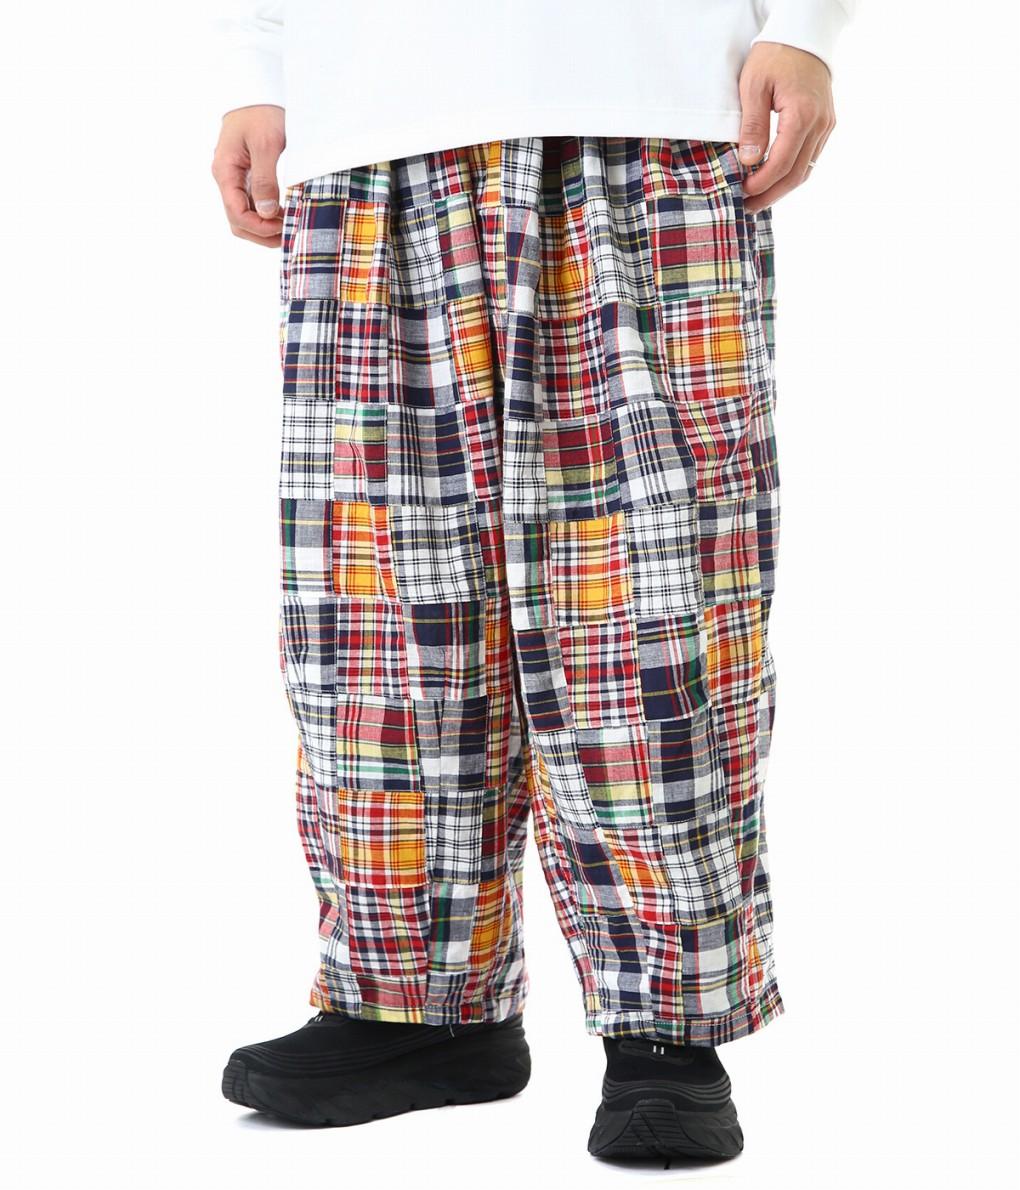 is-ness / イズネス : BALLOON EZ PANTS / 全3色 : バルーン イージー パンツ メンズ : 28PT01T01【NOA】